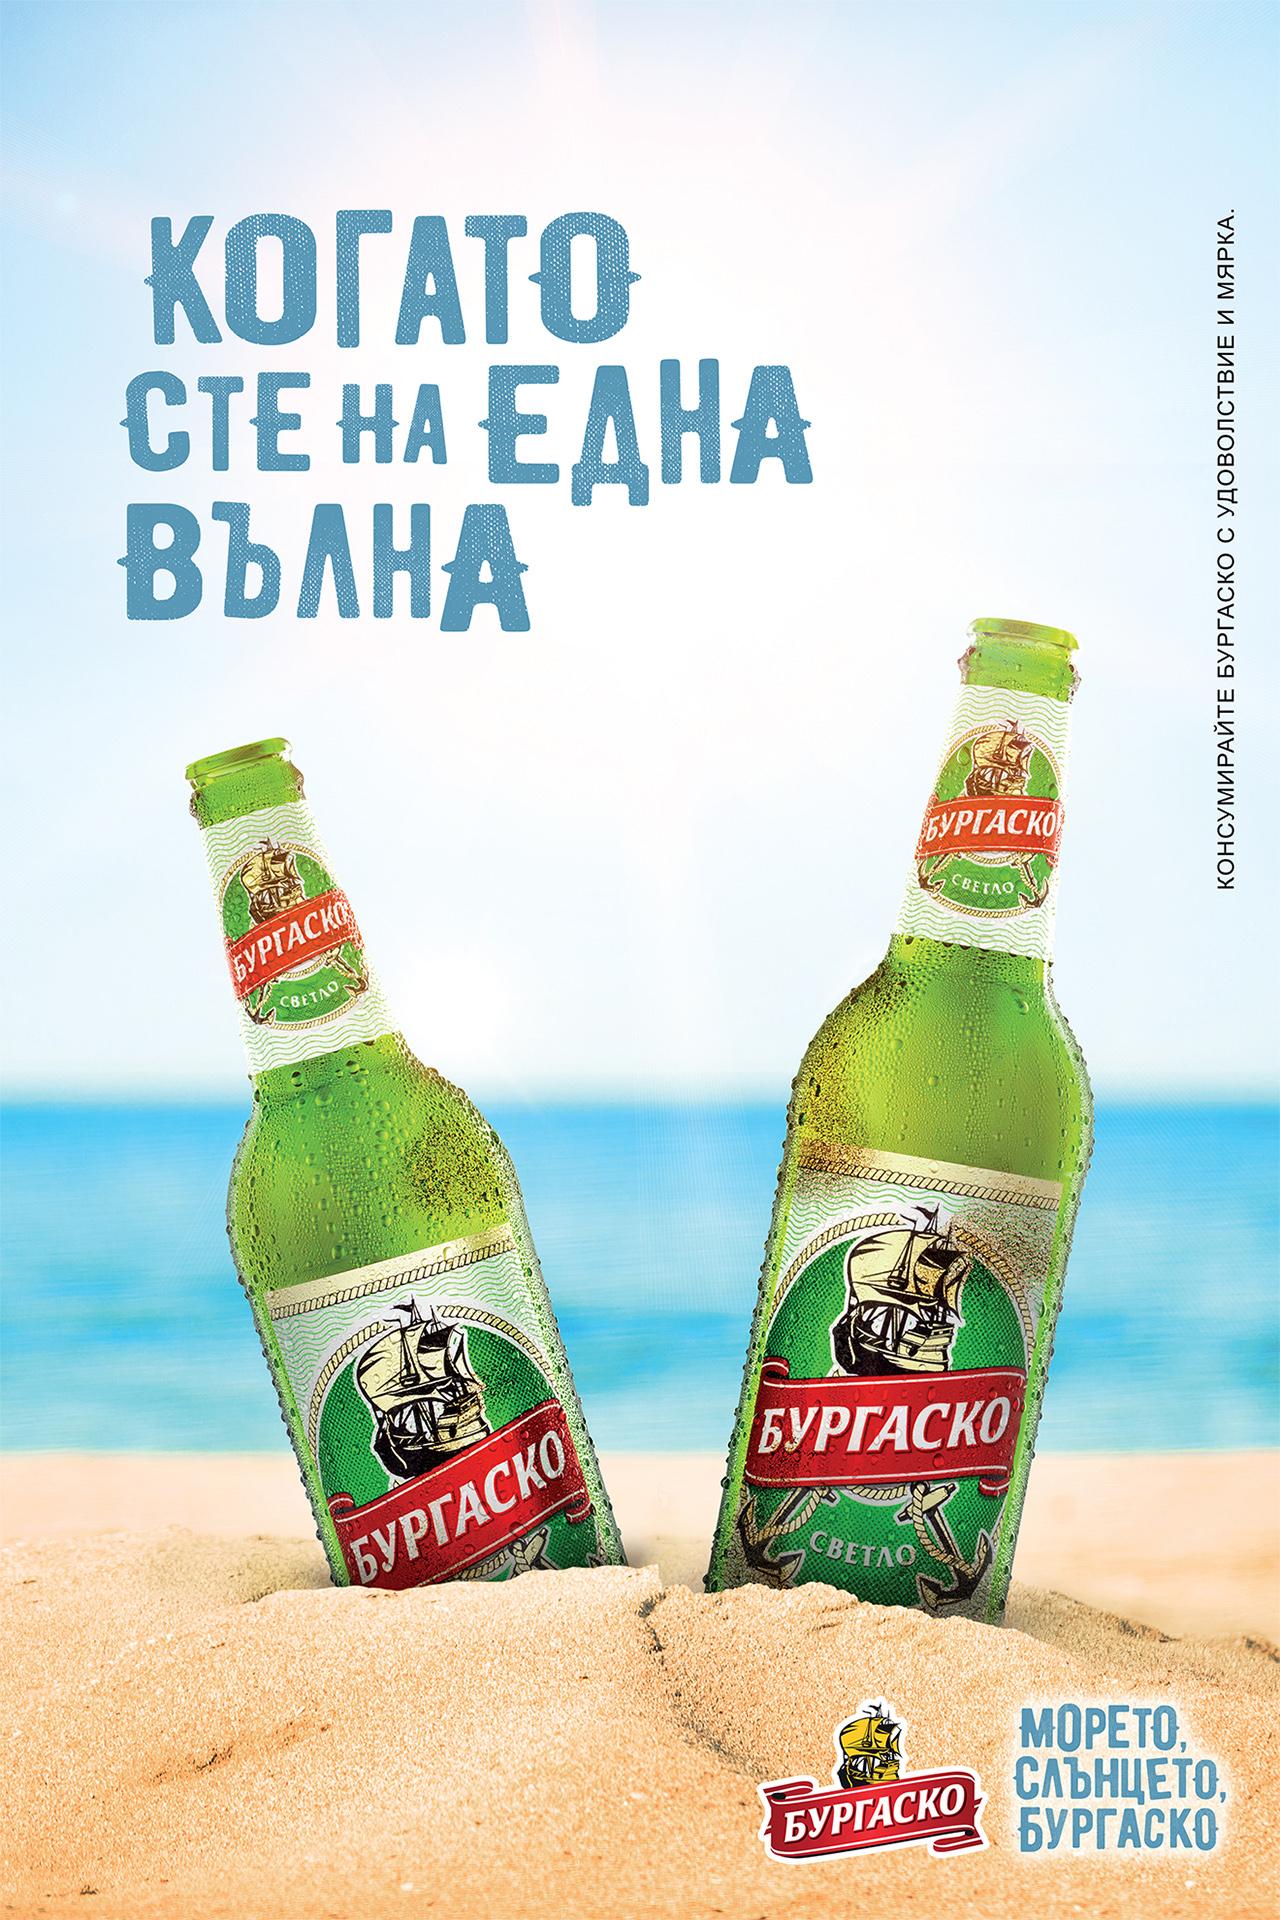 42KAM16001 Burgasko 1.20x1.80cm Bottles